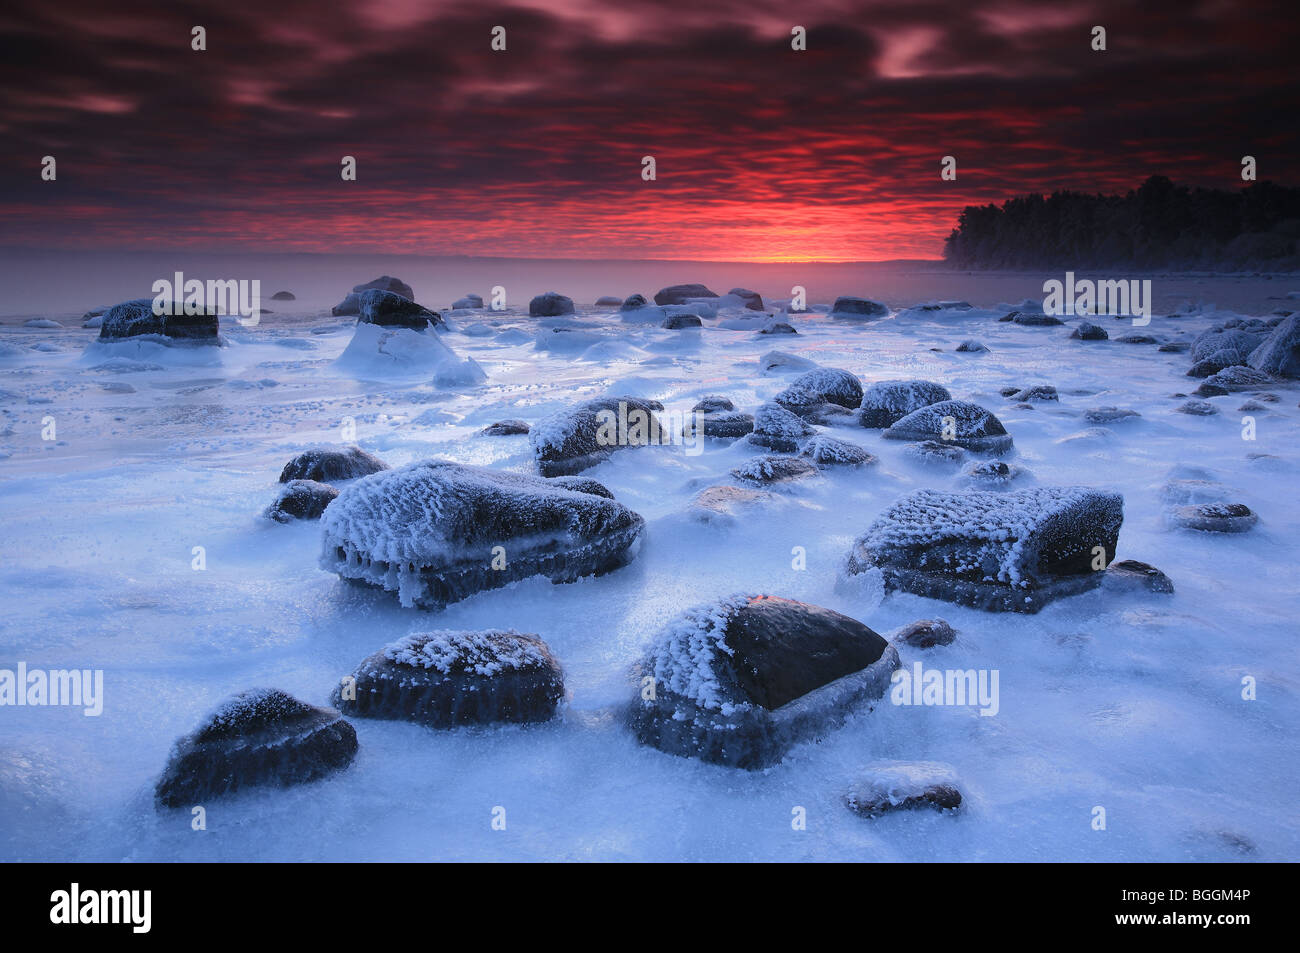 Paysage côtier gelés à l'aube, à Larkollen à Rygge, Østfold fylke, la Norvège. Photo Stock